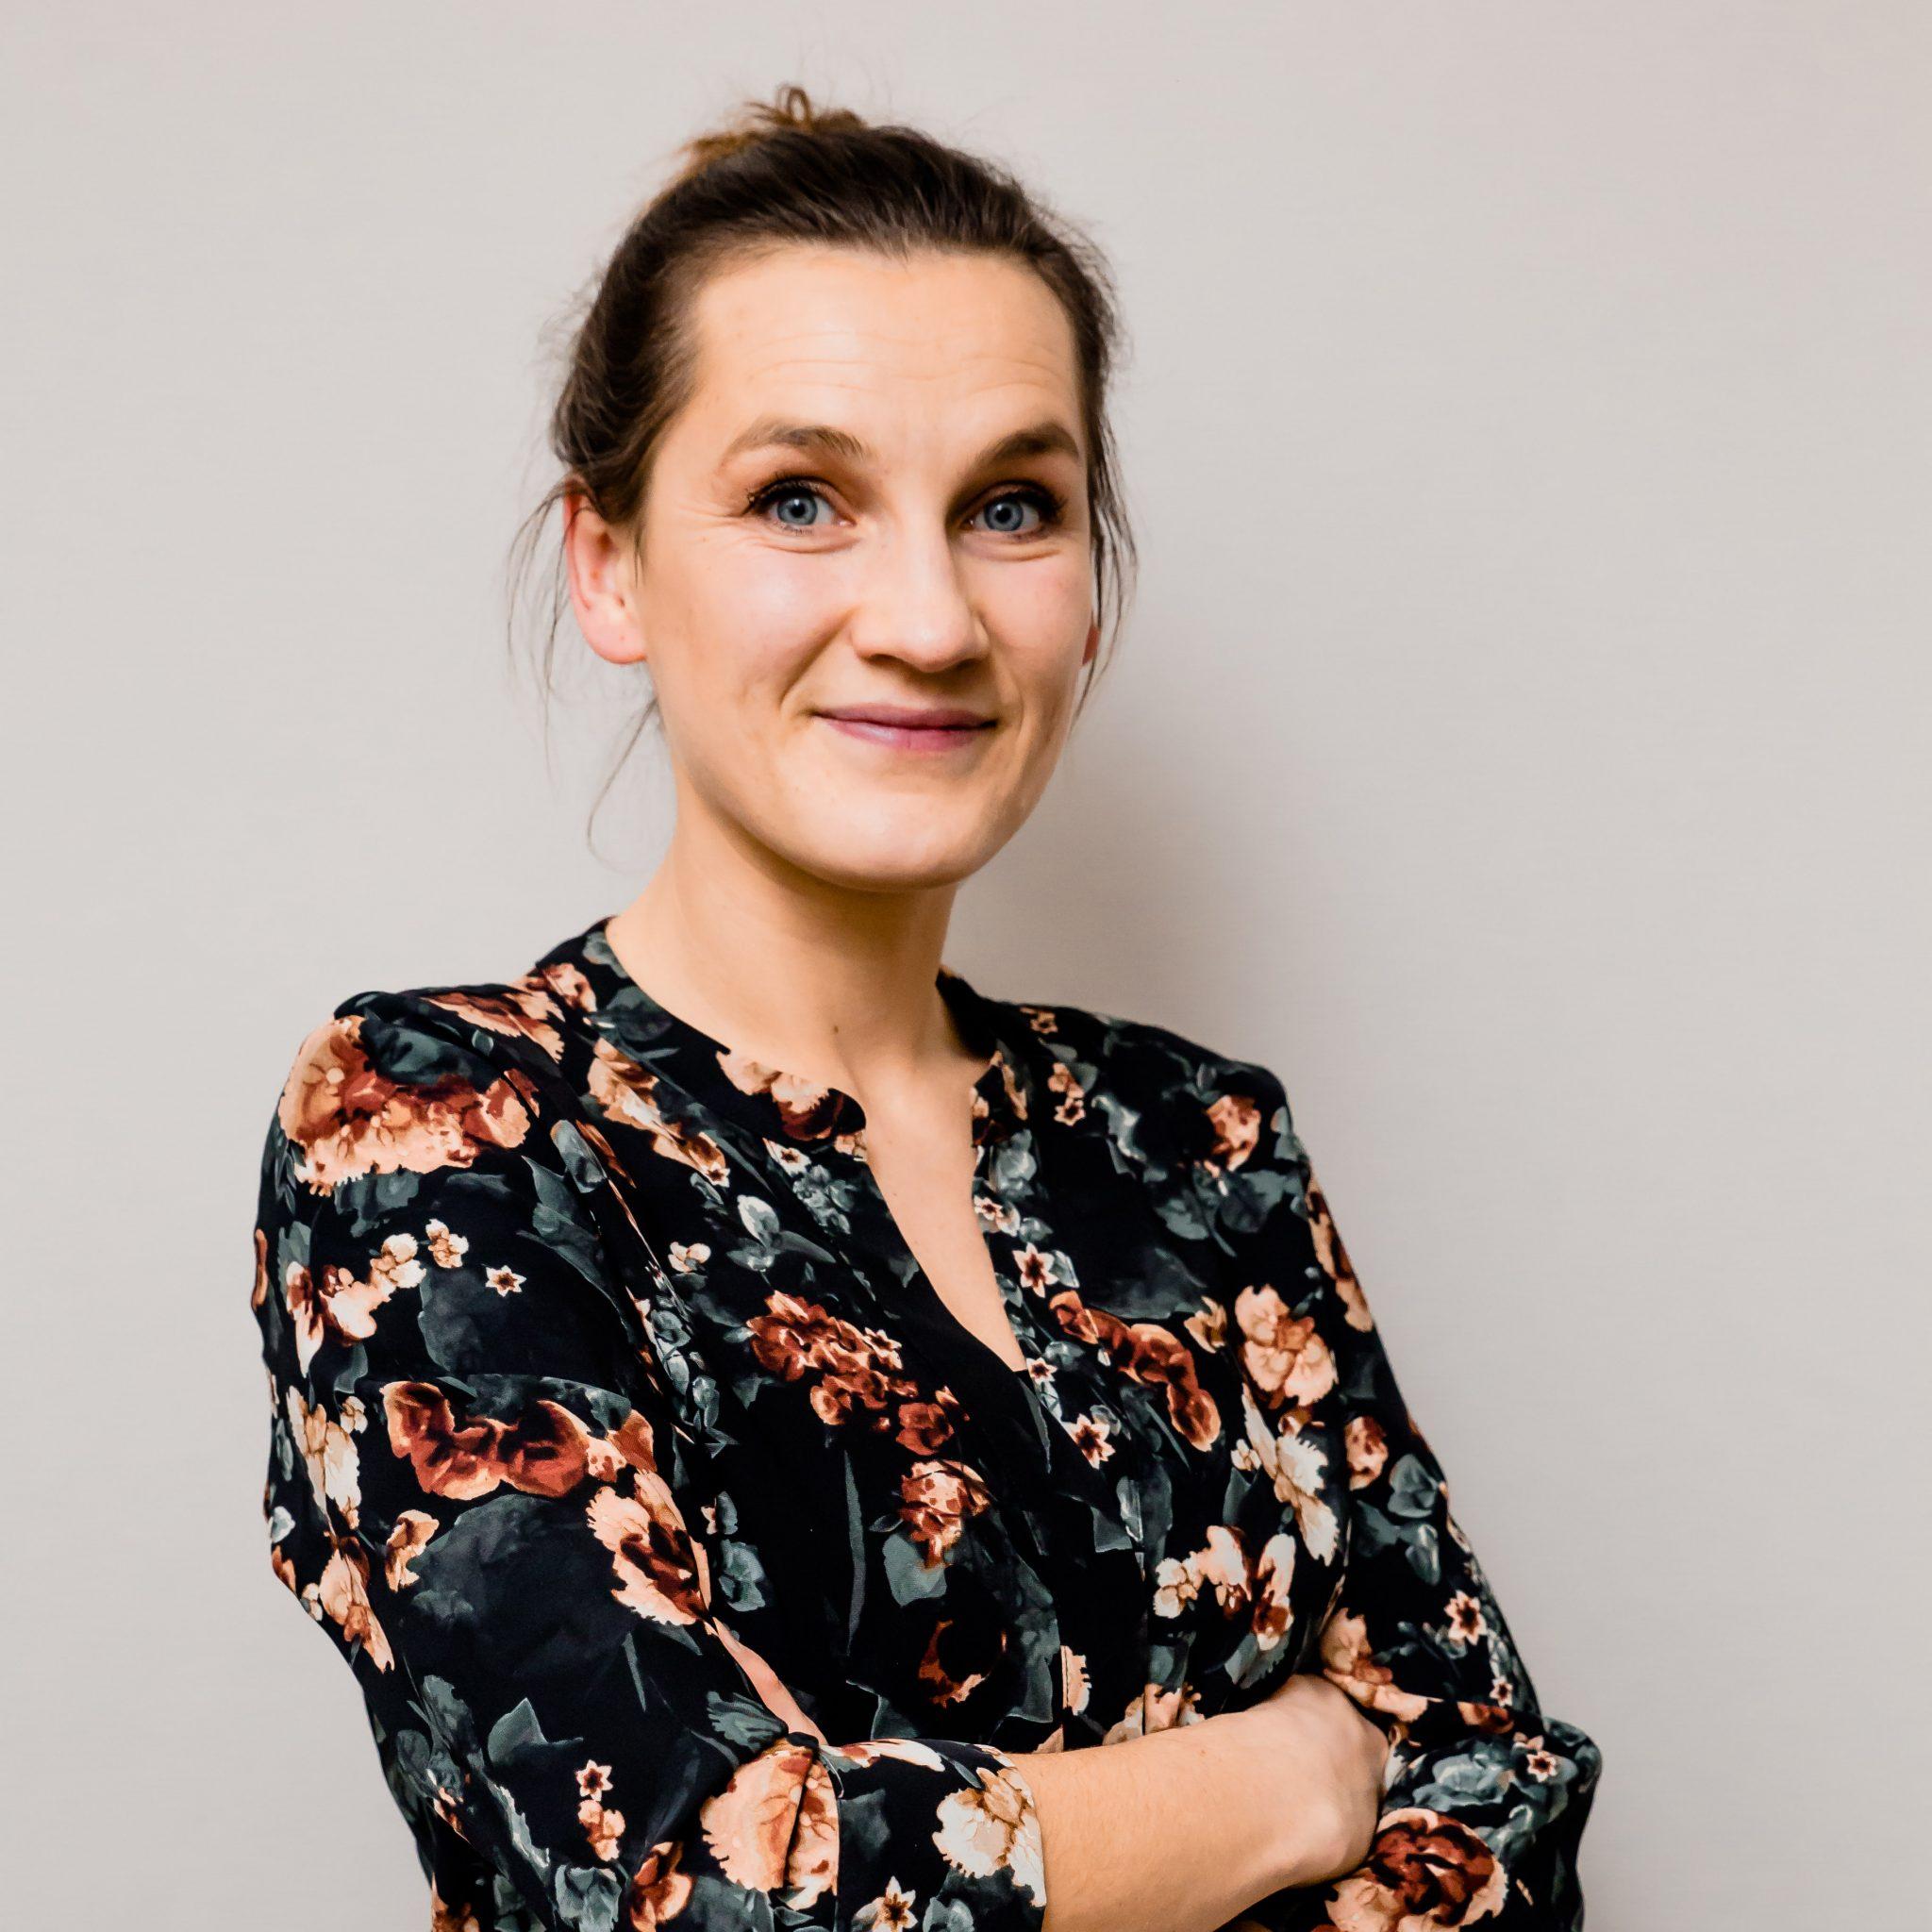 Ewa Patejko